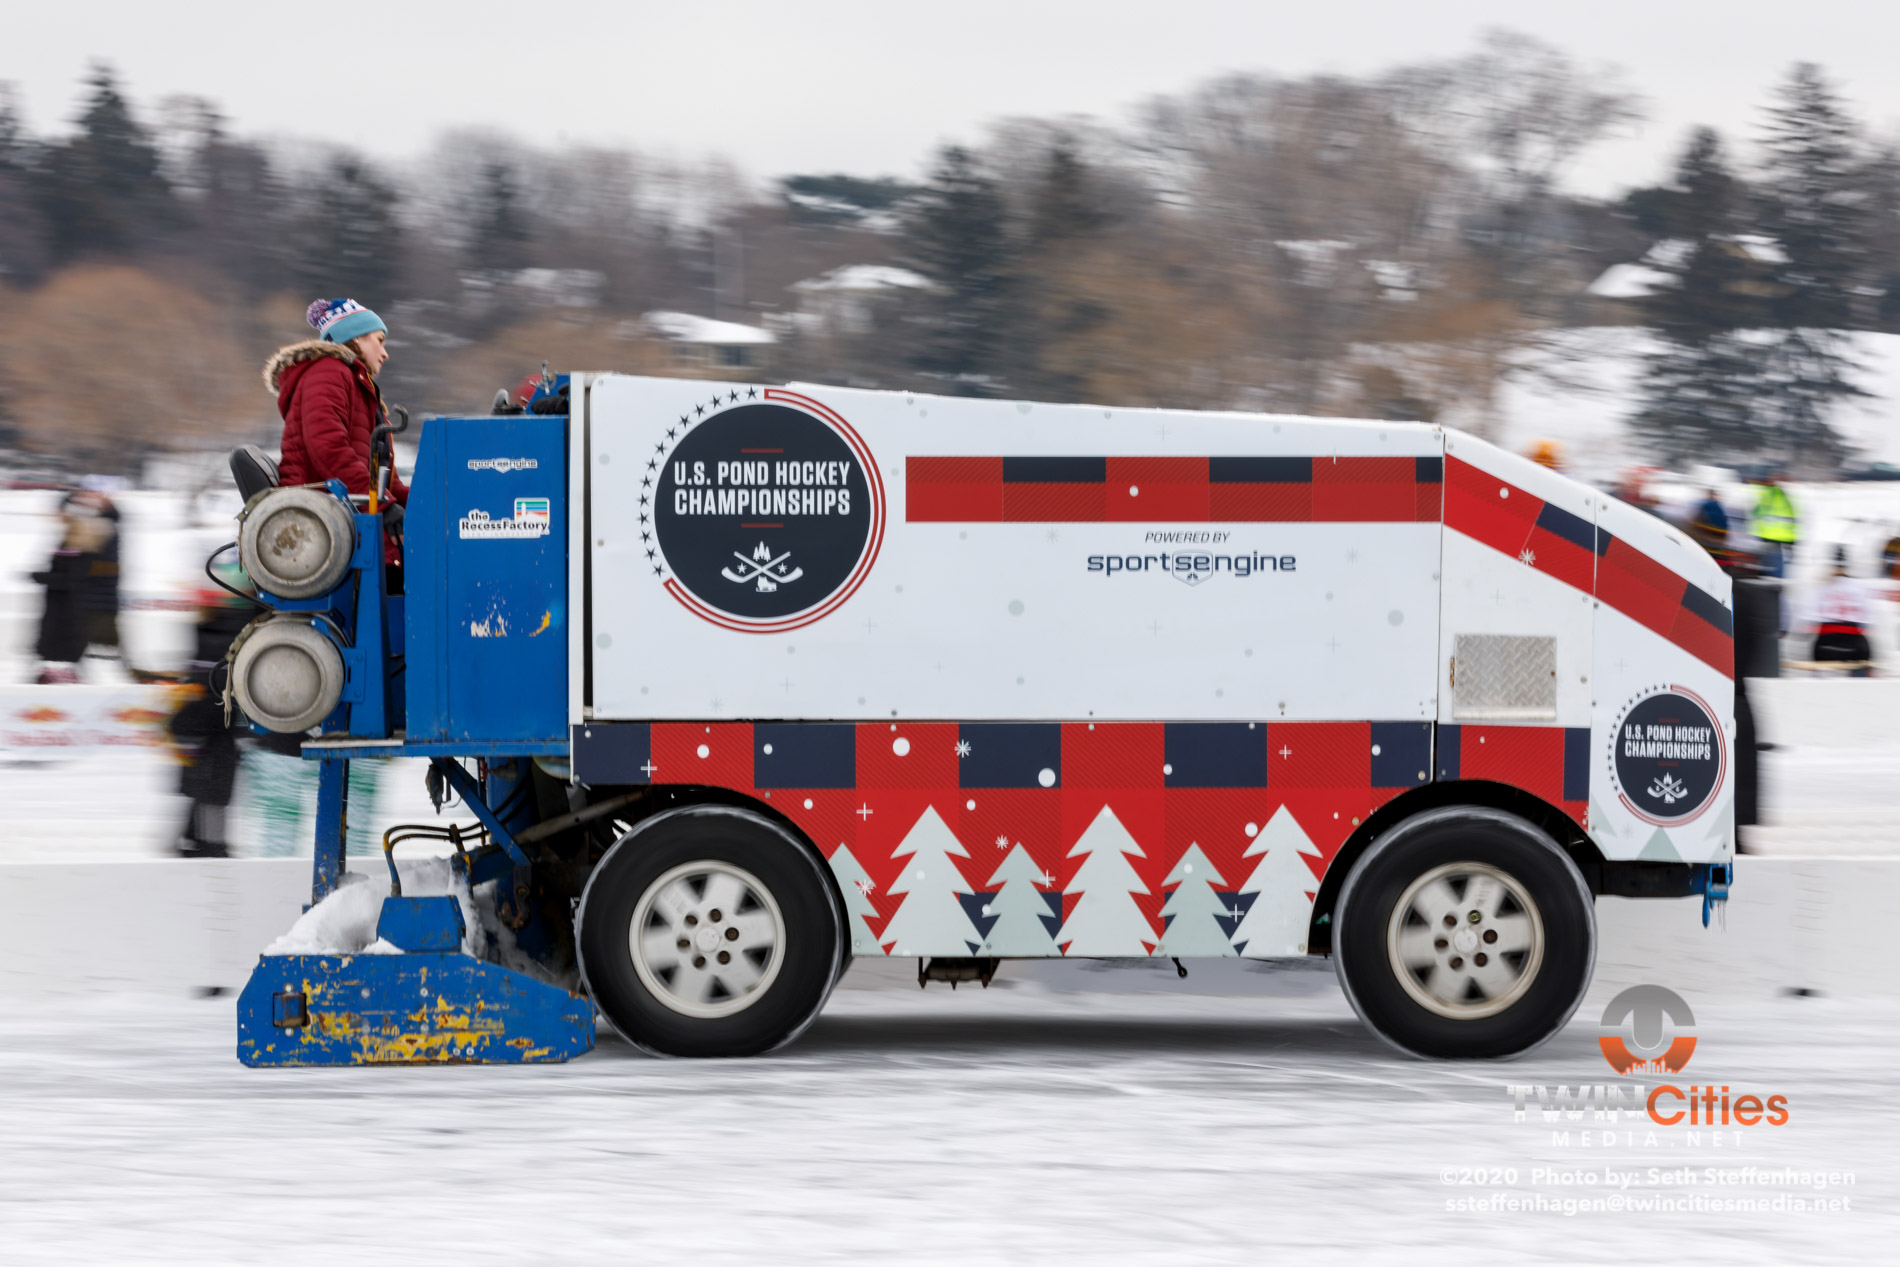 January 26, 2020 - Minneapolis, Minnesota, United States - A zamboni cleans the ice at the U.S. Pond Hockey Championships on Lake Nokomis.   (Photo by Seth Steffenhagen/Steffenhagen Photography)